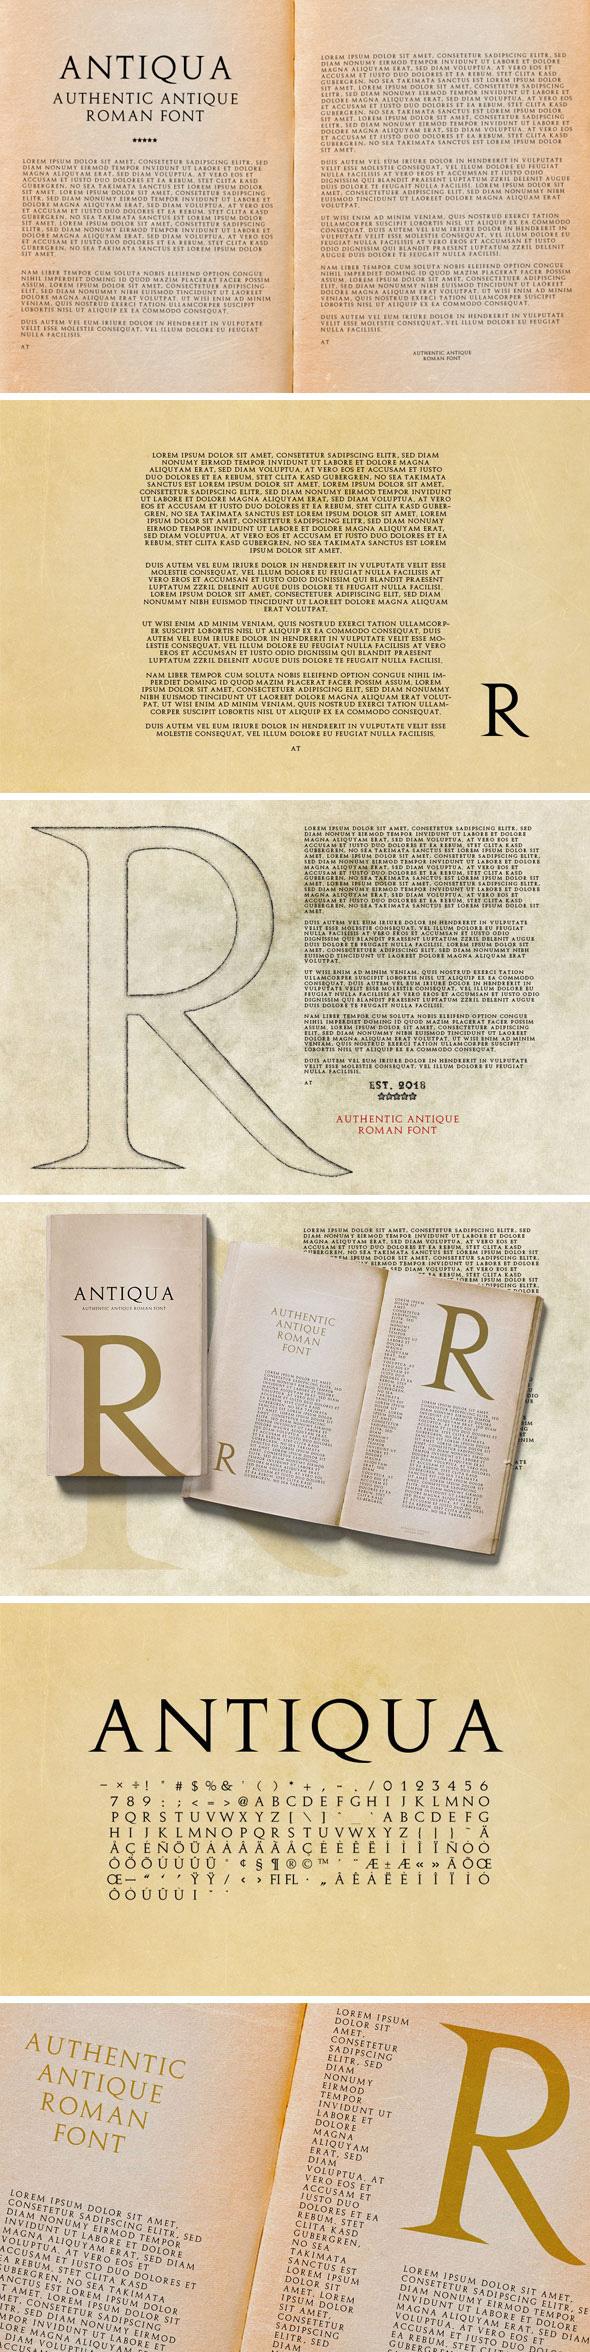 Antiqua - Antique Roman Font